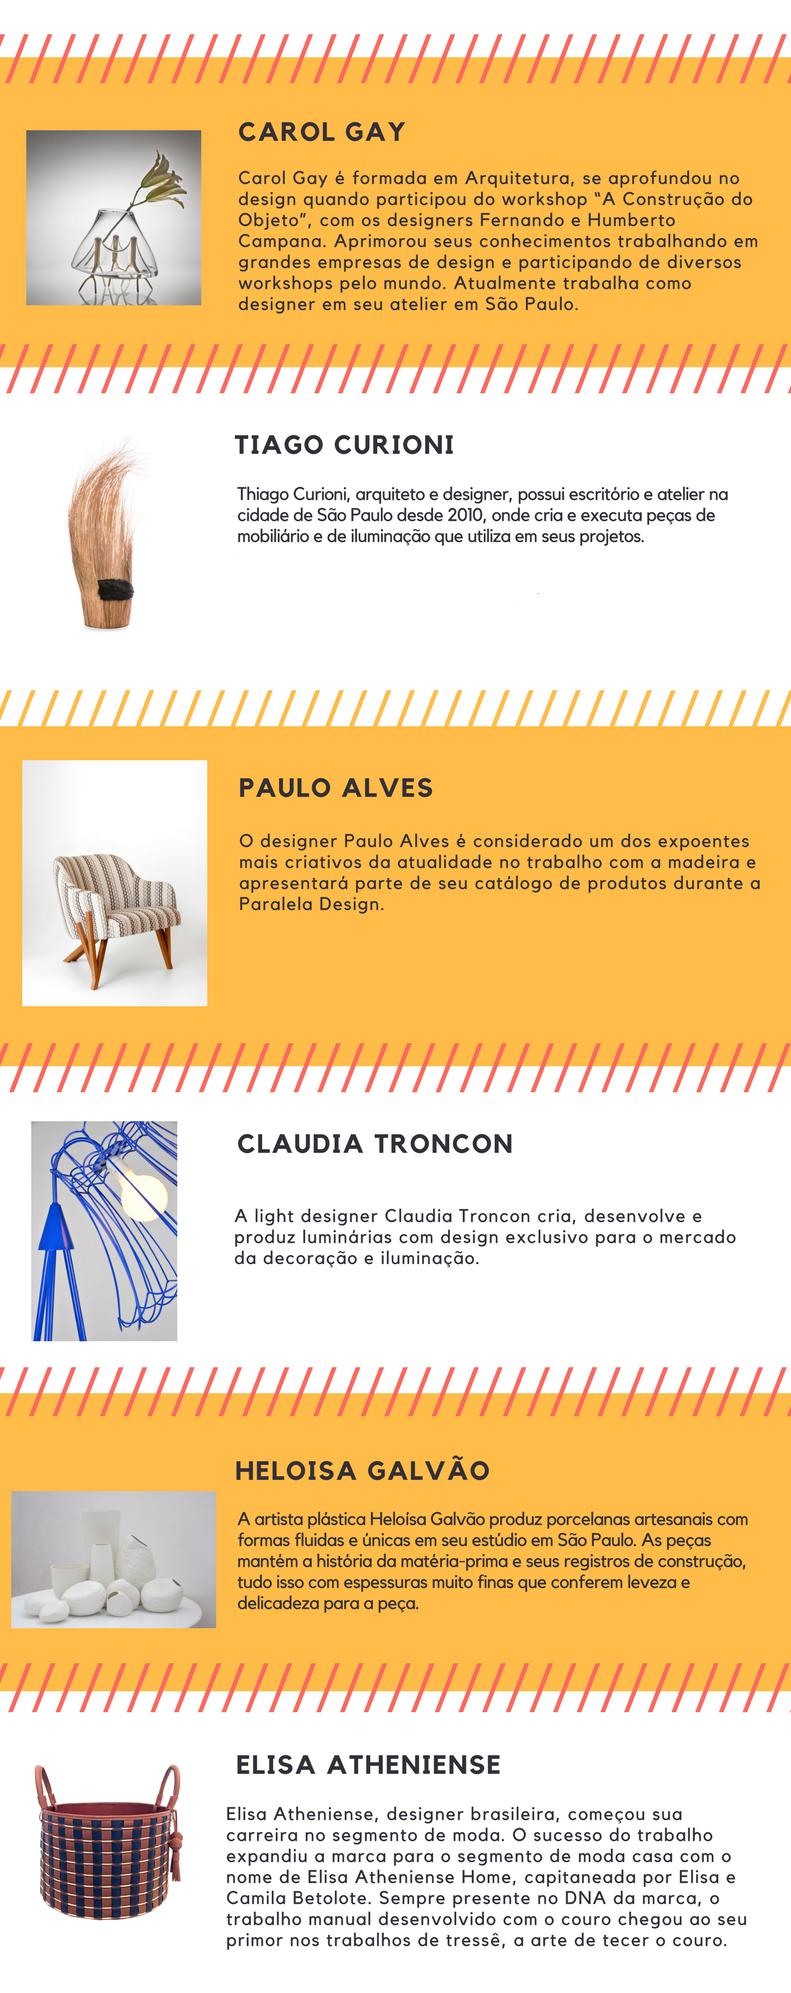 feira-paralela-design-2018-expositores-2